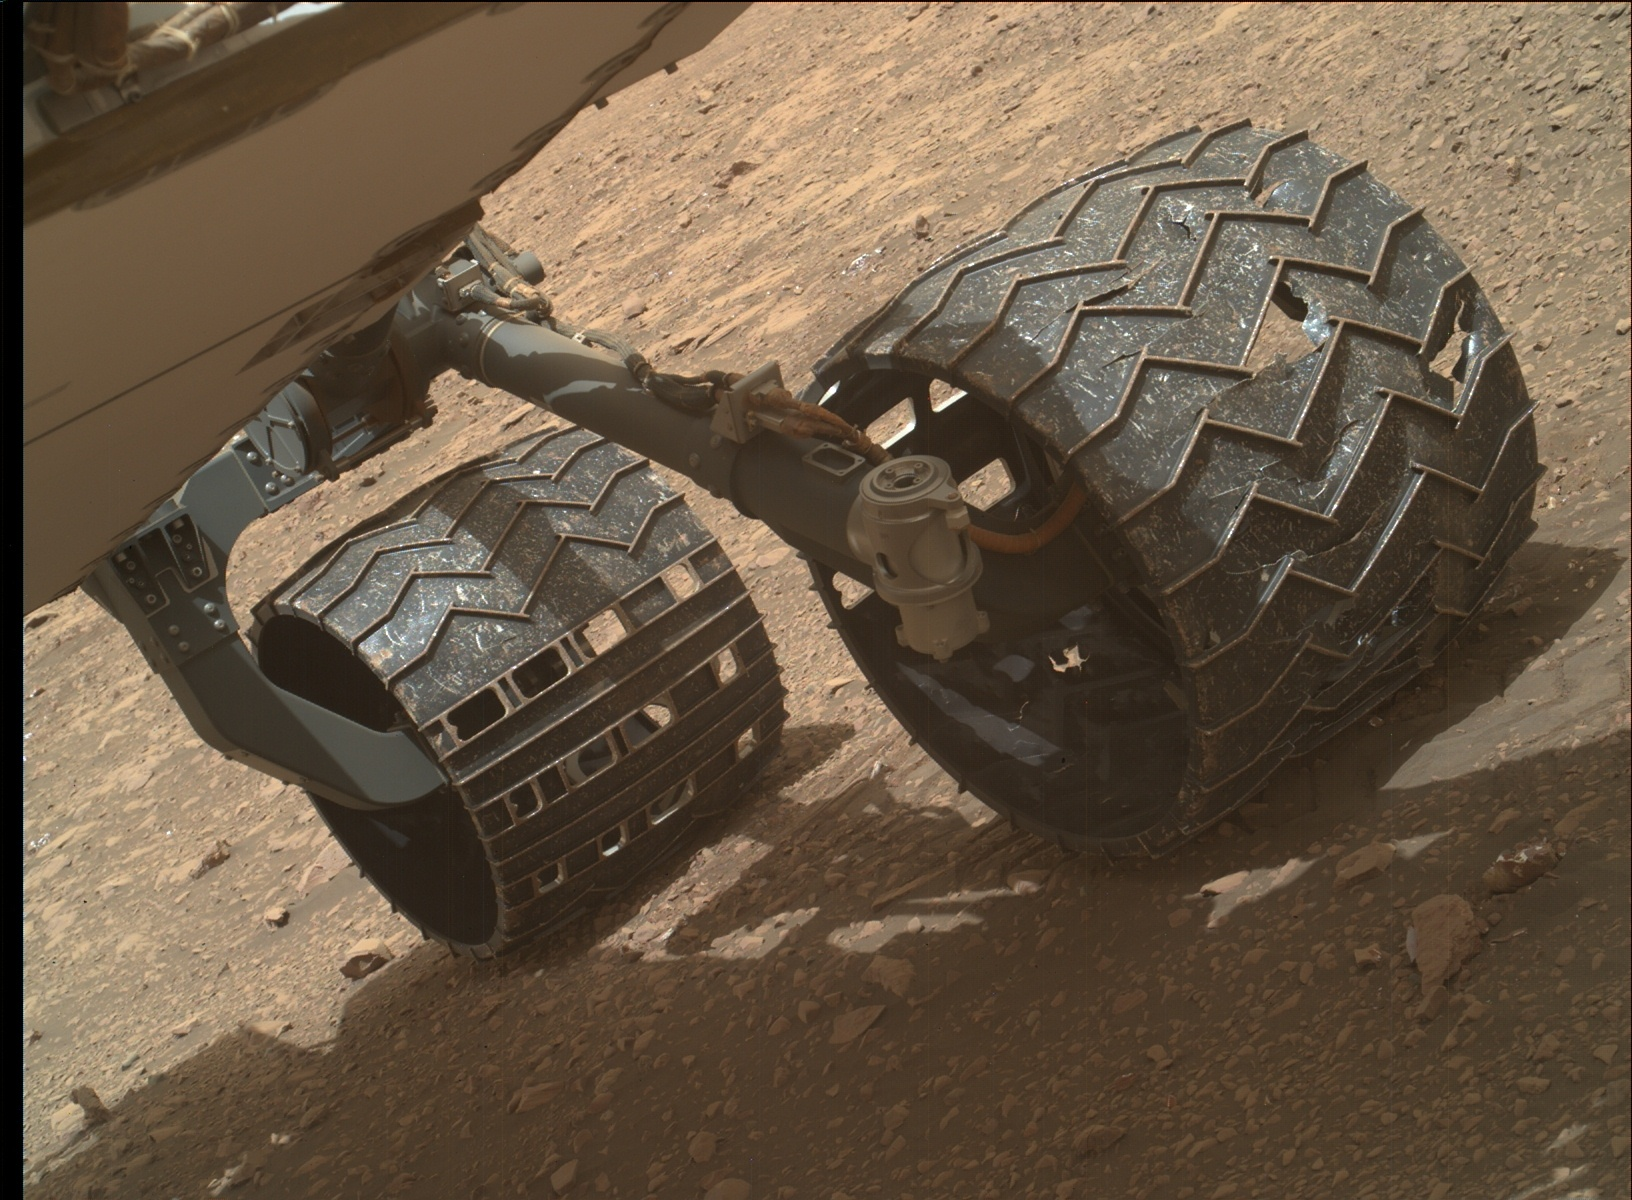 Sol 2032-2033: The Rocks vs. Stone Cold Aluminum Wheels